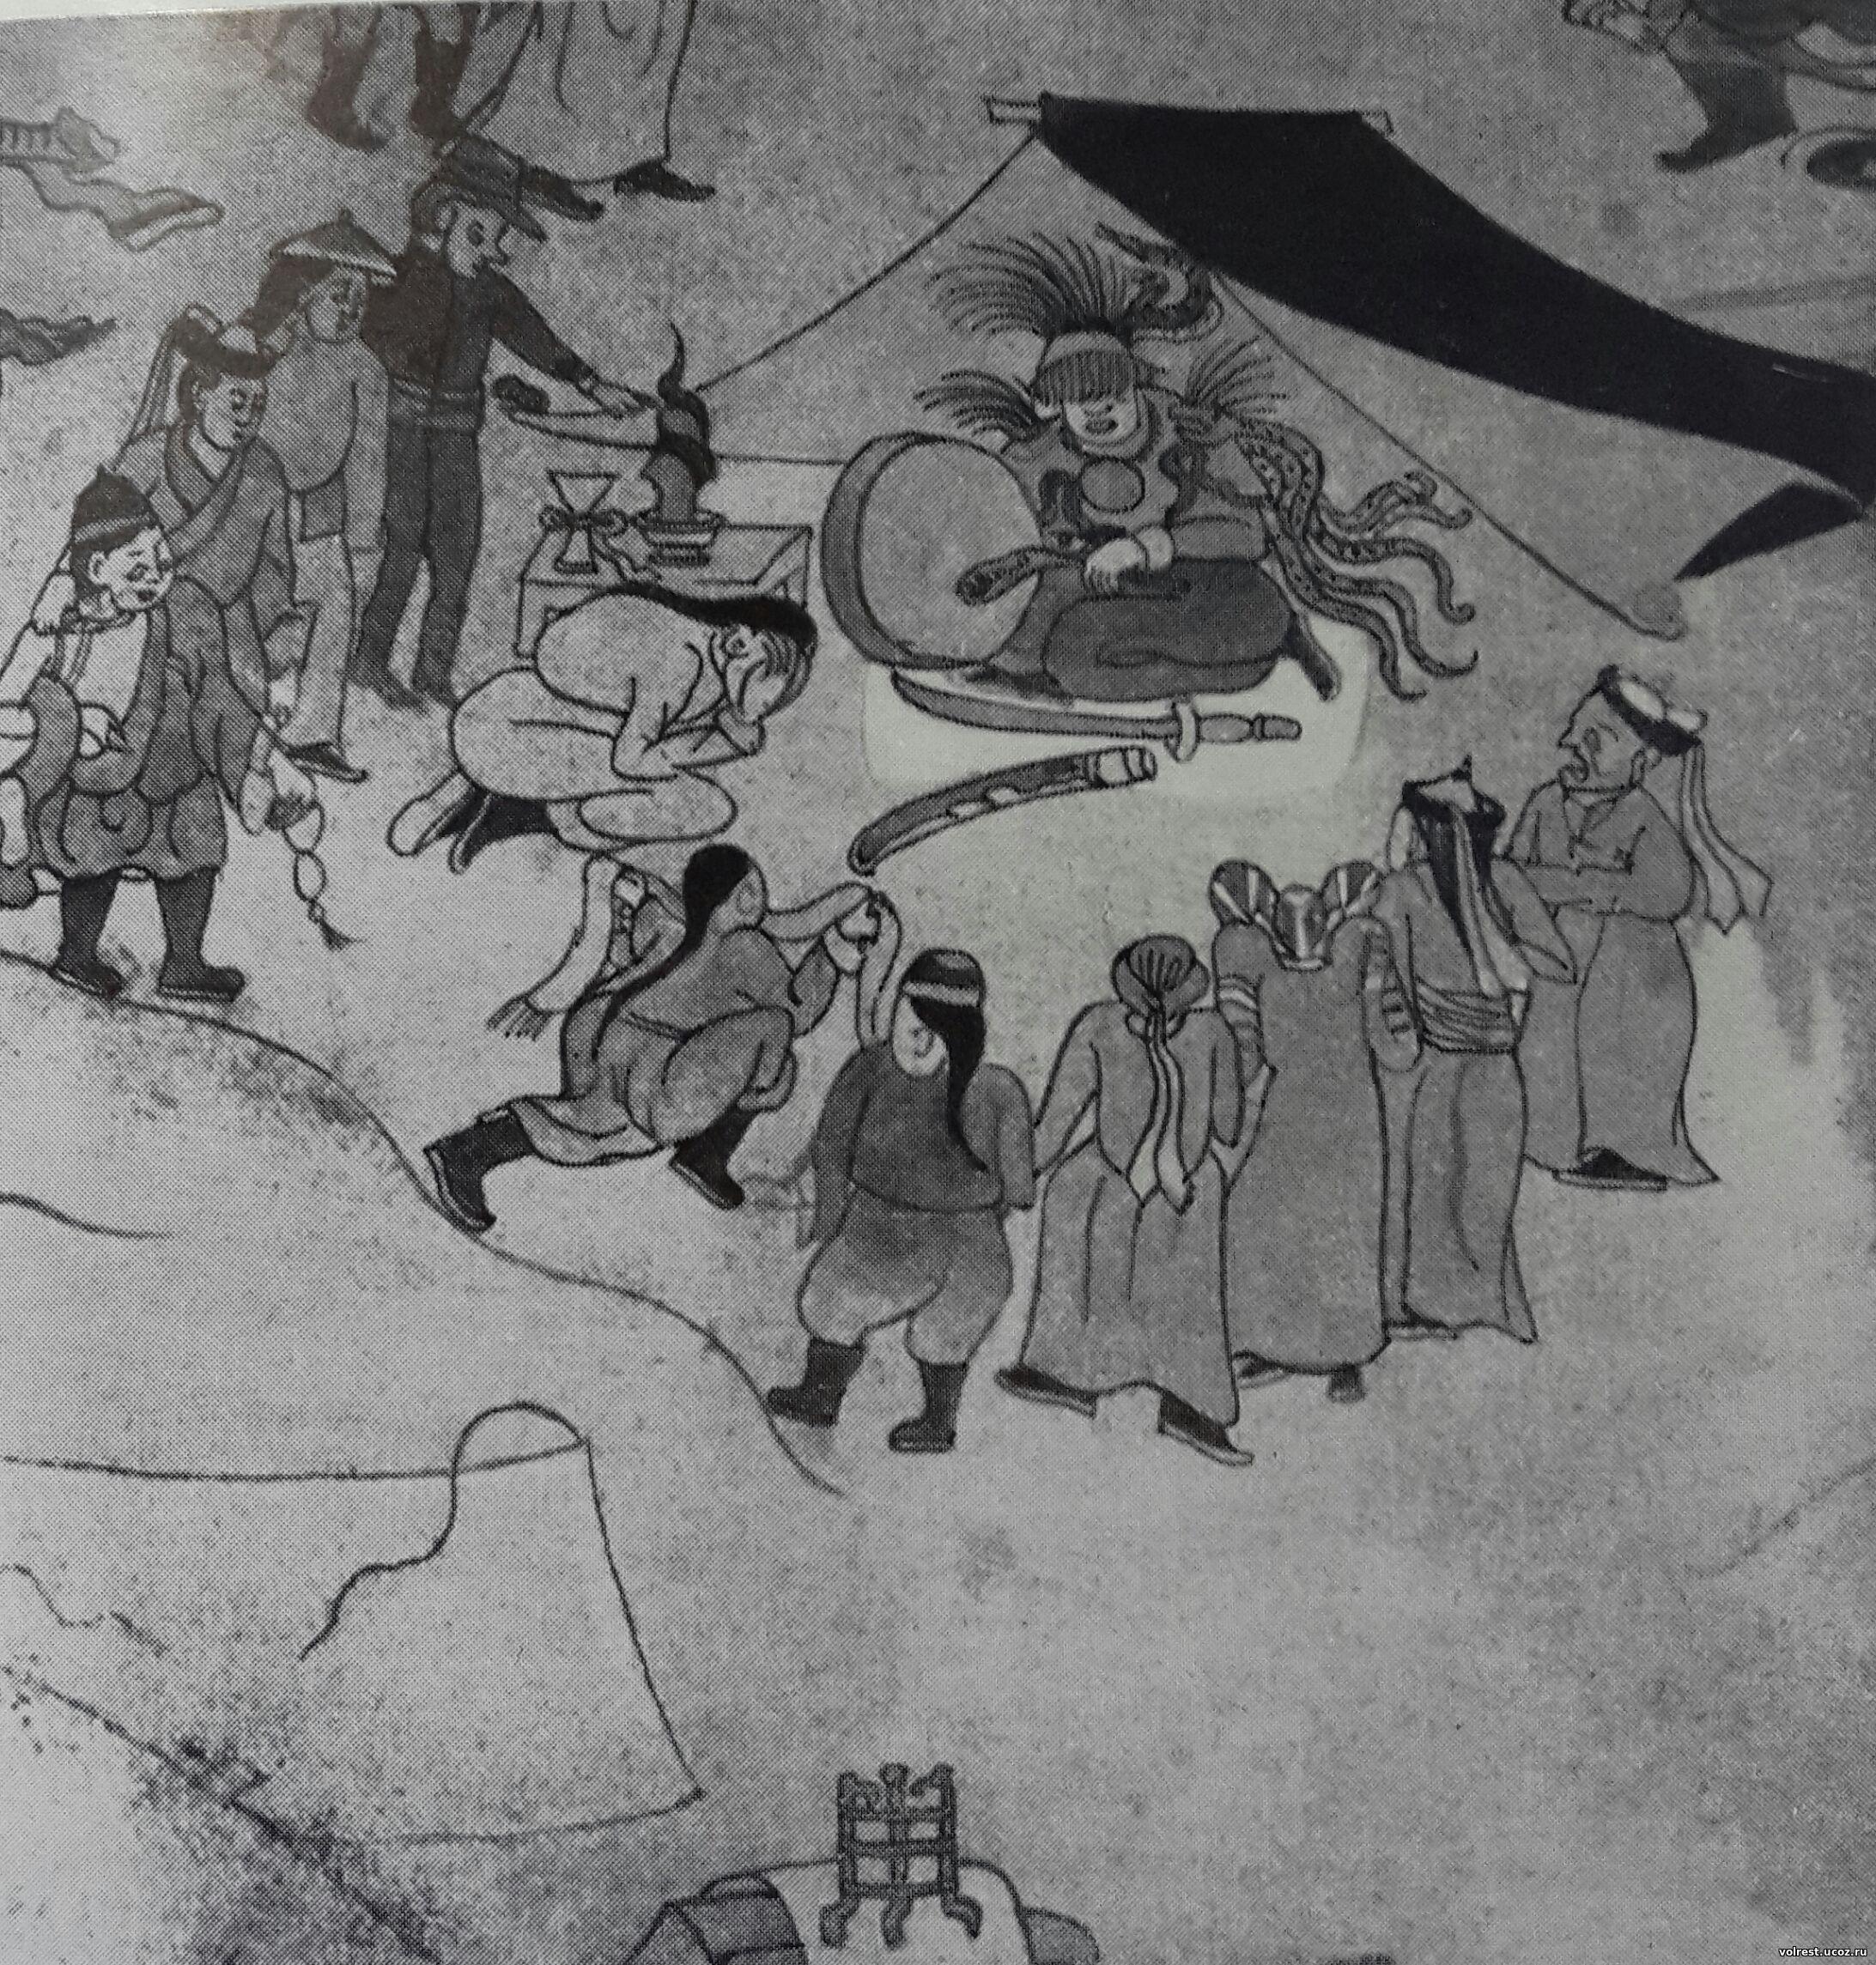 5-4_odin_den_mongolii_fragment_shaman_ka